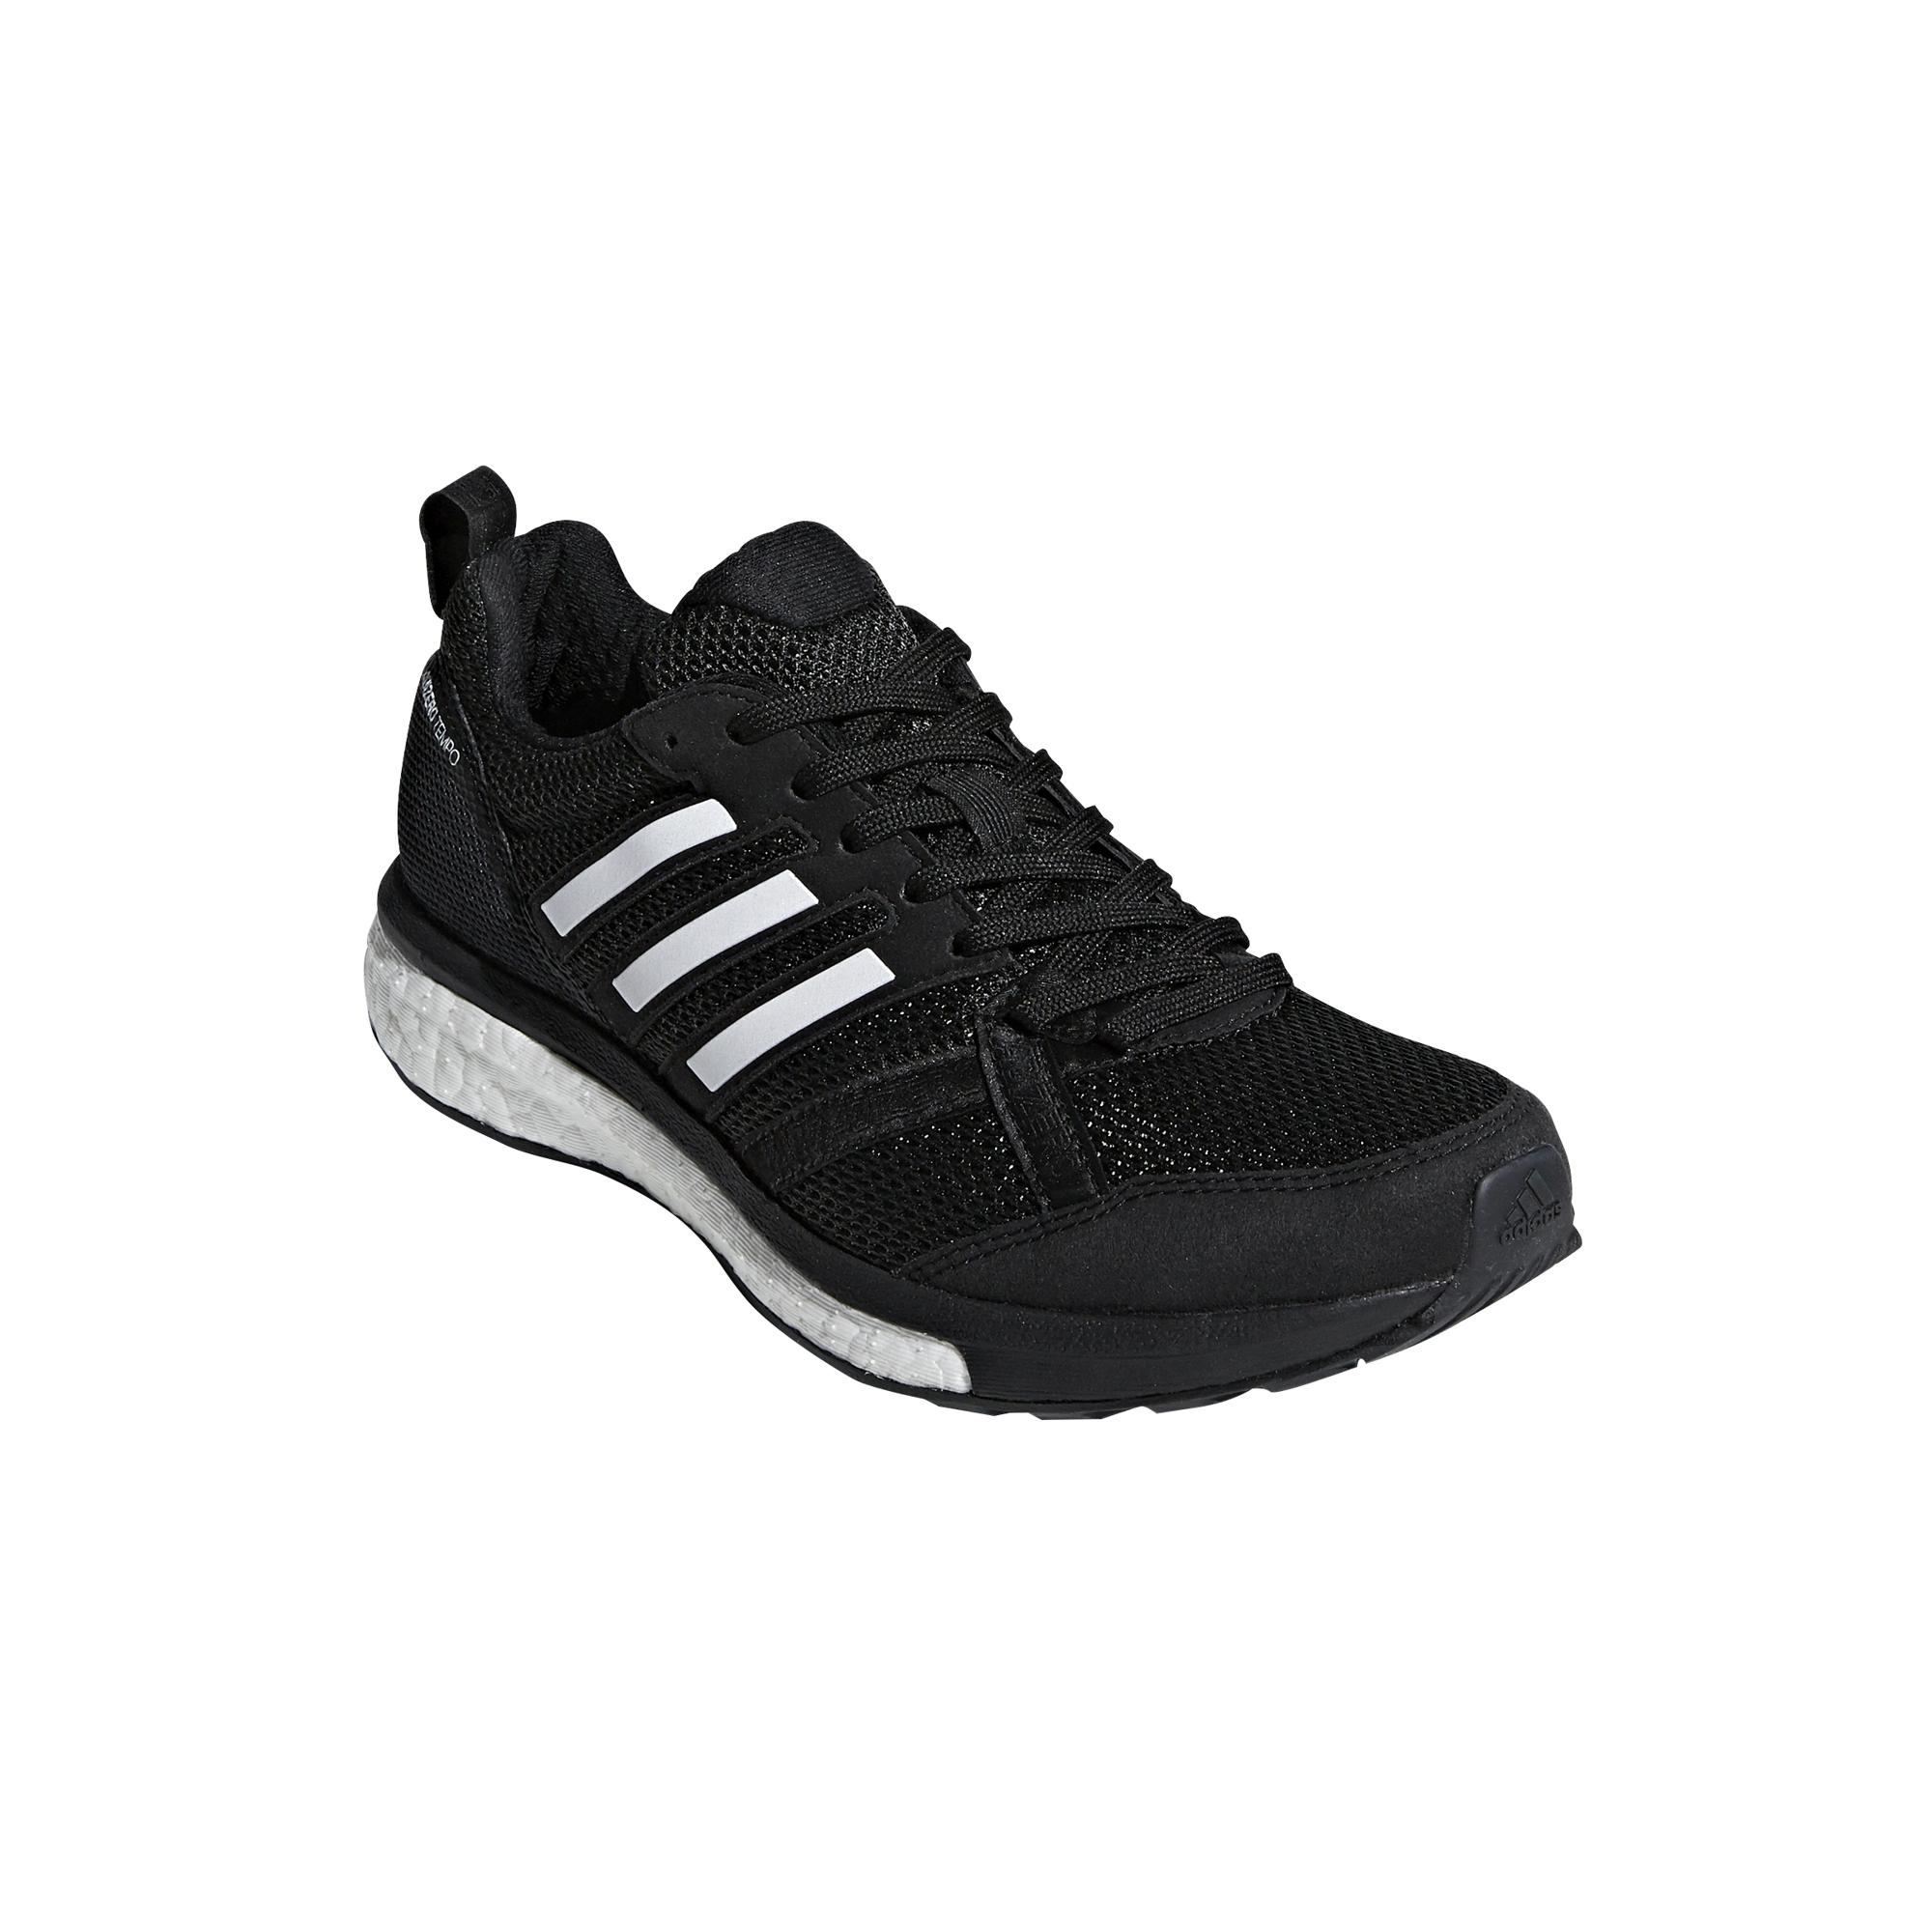 half off 0a21f f0a01 Chaussures femme adidas s adizero Tempo 9